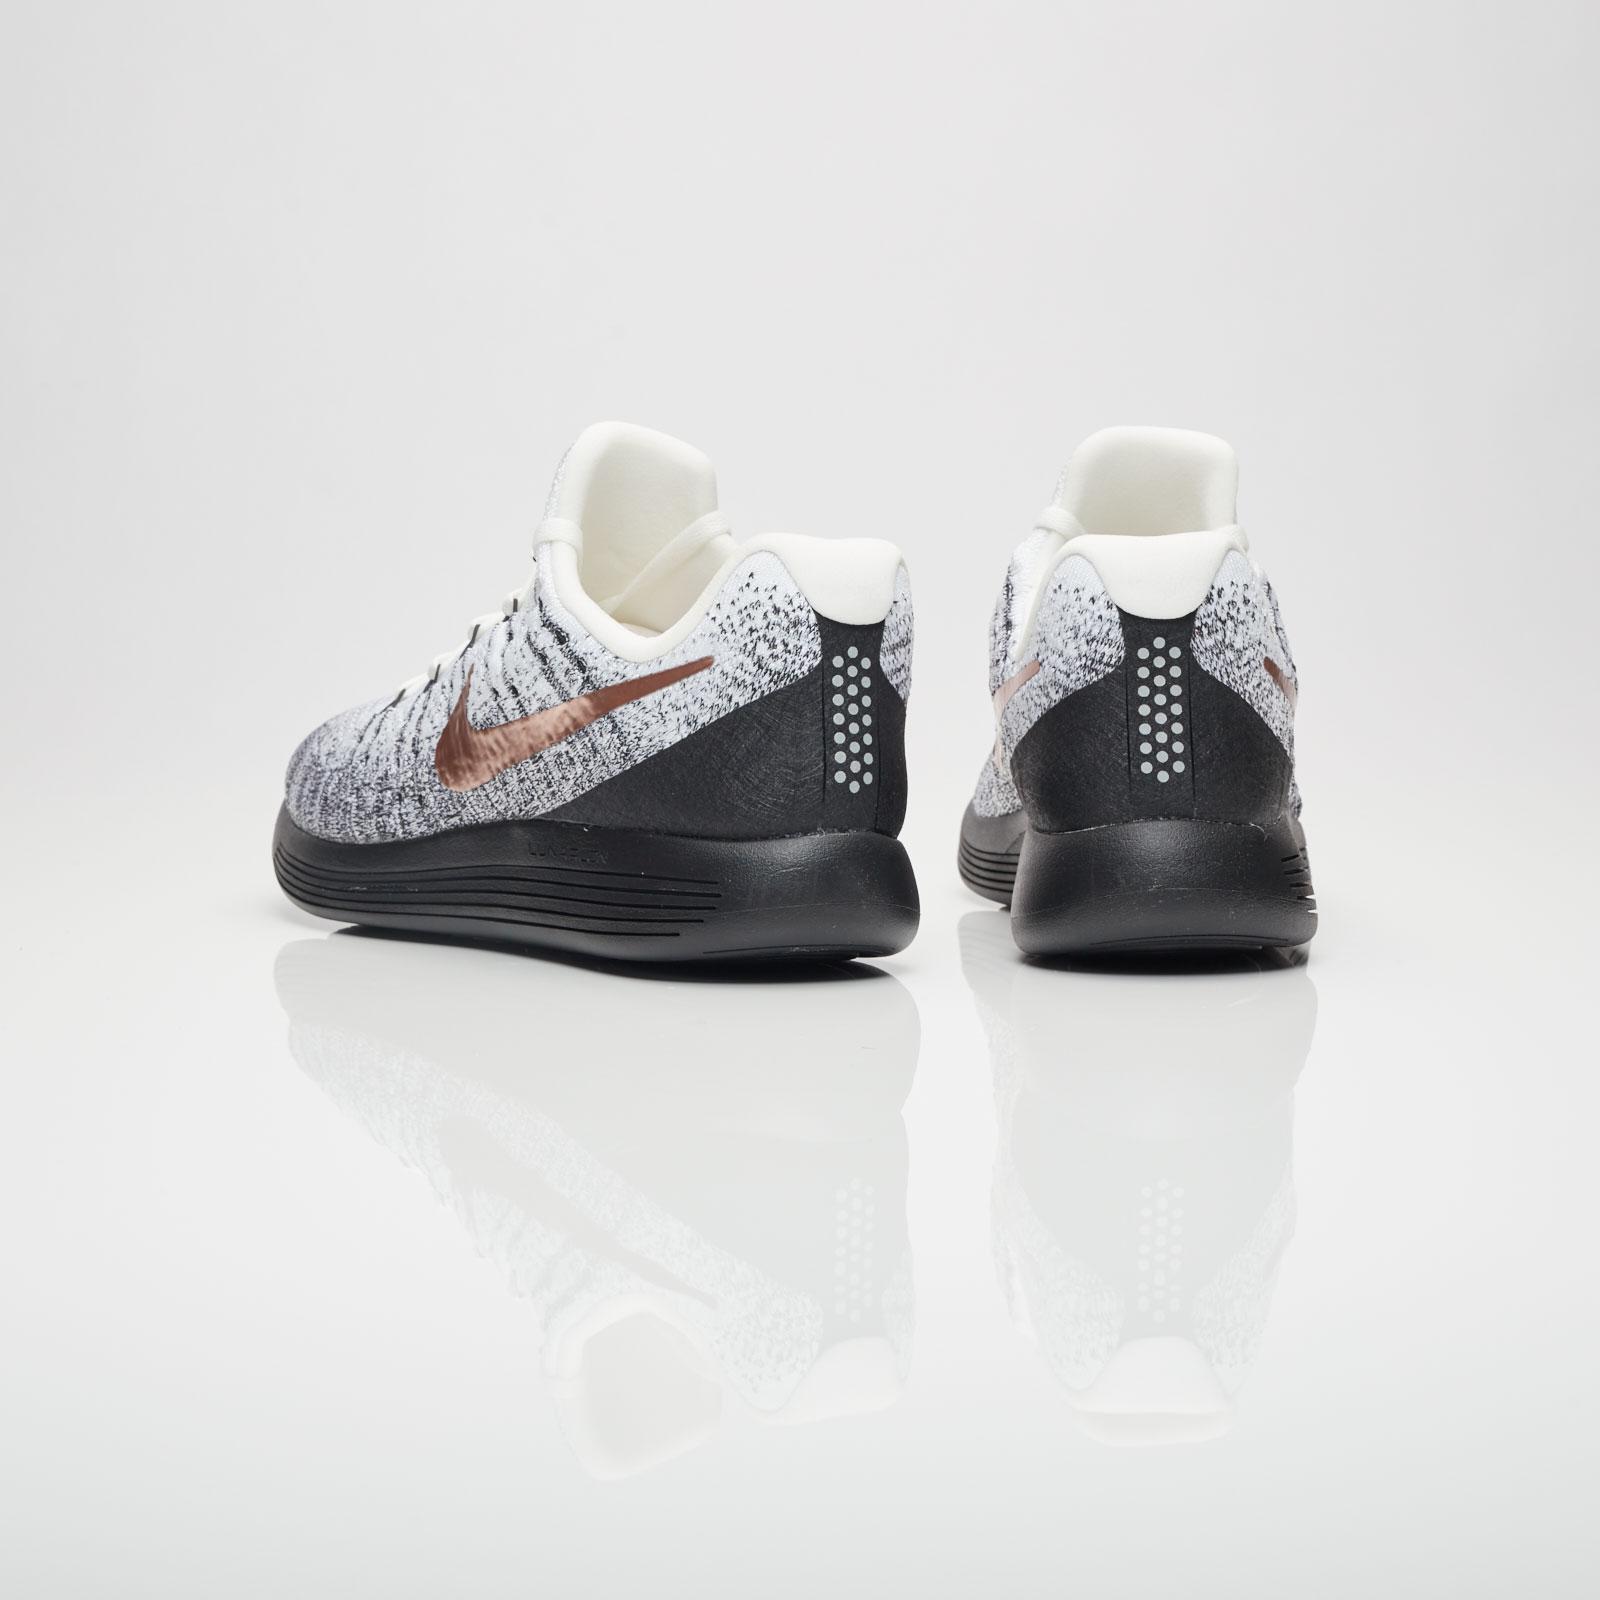 e03ca39ddd59 Nike Lunarepic Low FK 2 X-Plore - 904742-100 - Sneakersnstuff ...